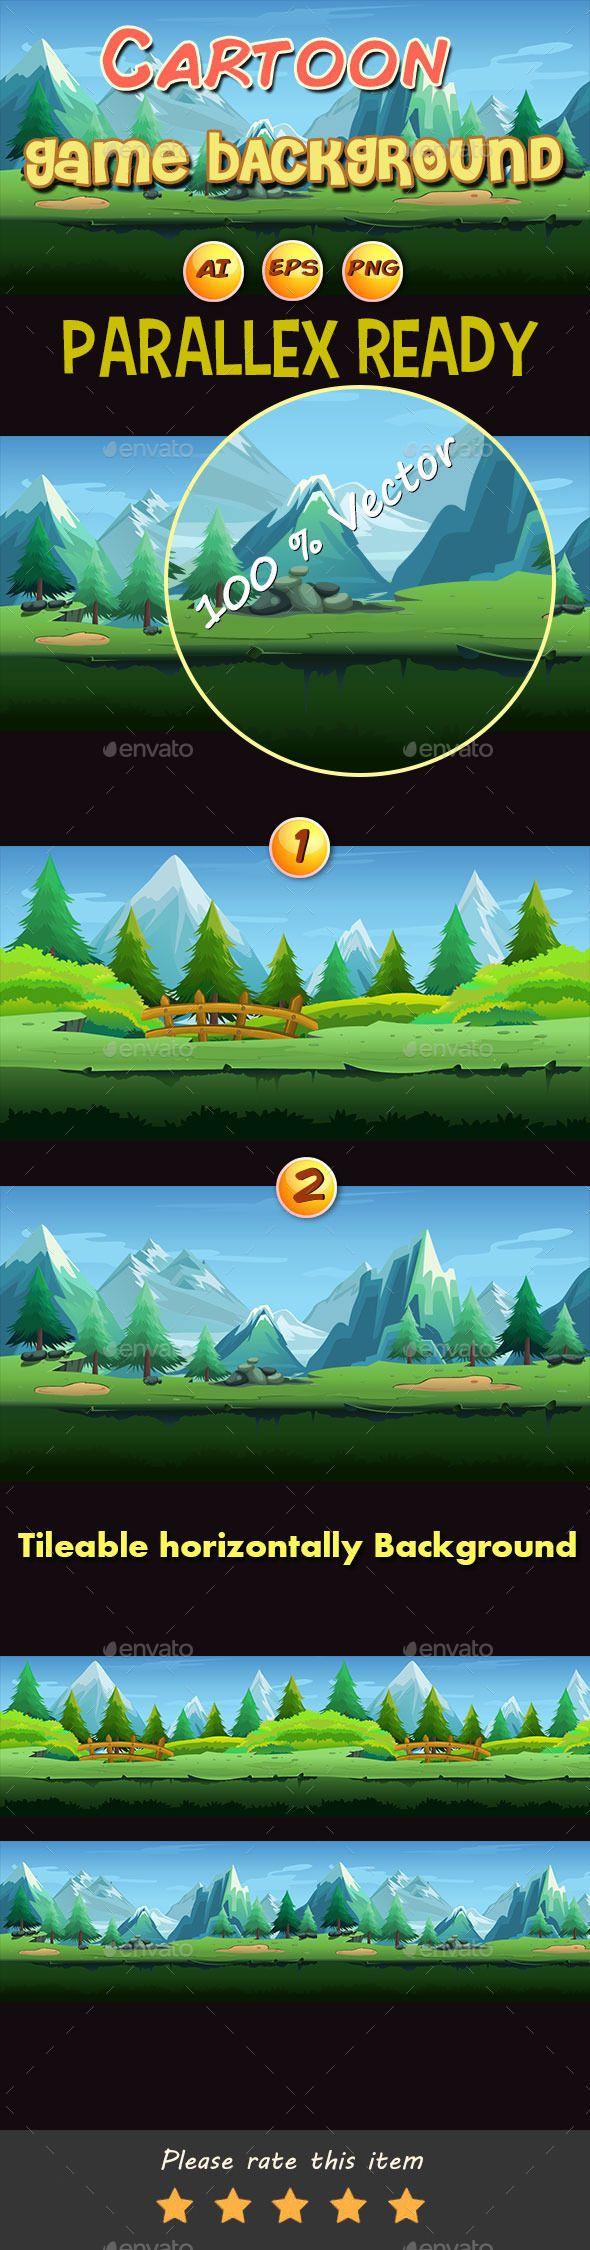 Cartoon Game Backgrounds Download here: https://graphicriver.net/item/cartoon-game-backgrounds/11889741?ref=KlitVogli